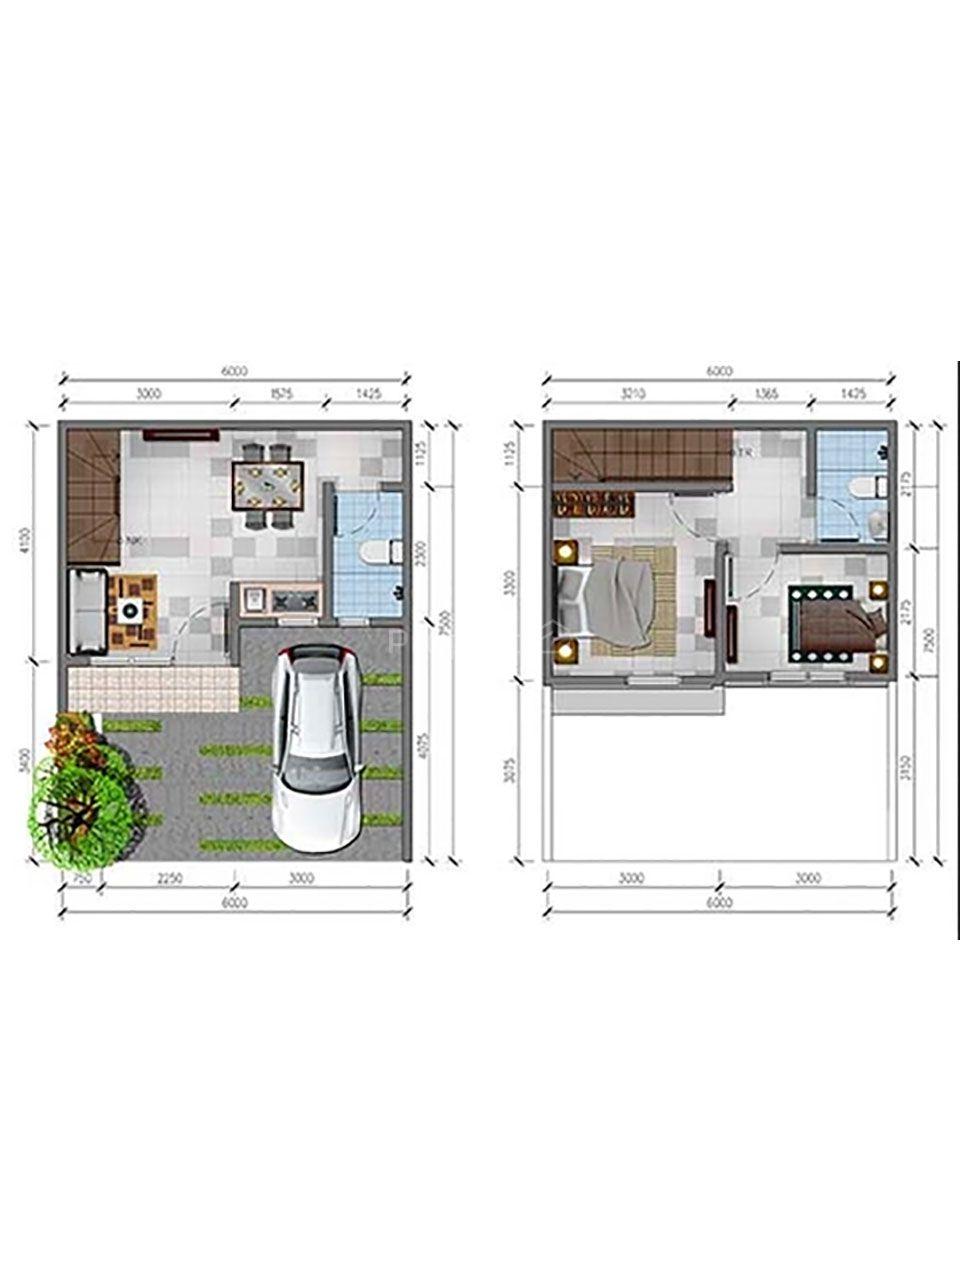 Rumah Minimalis Modern di Cluster River Garden Galuh Mas, Jawa Barat